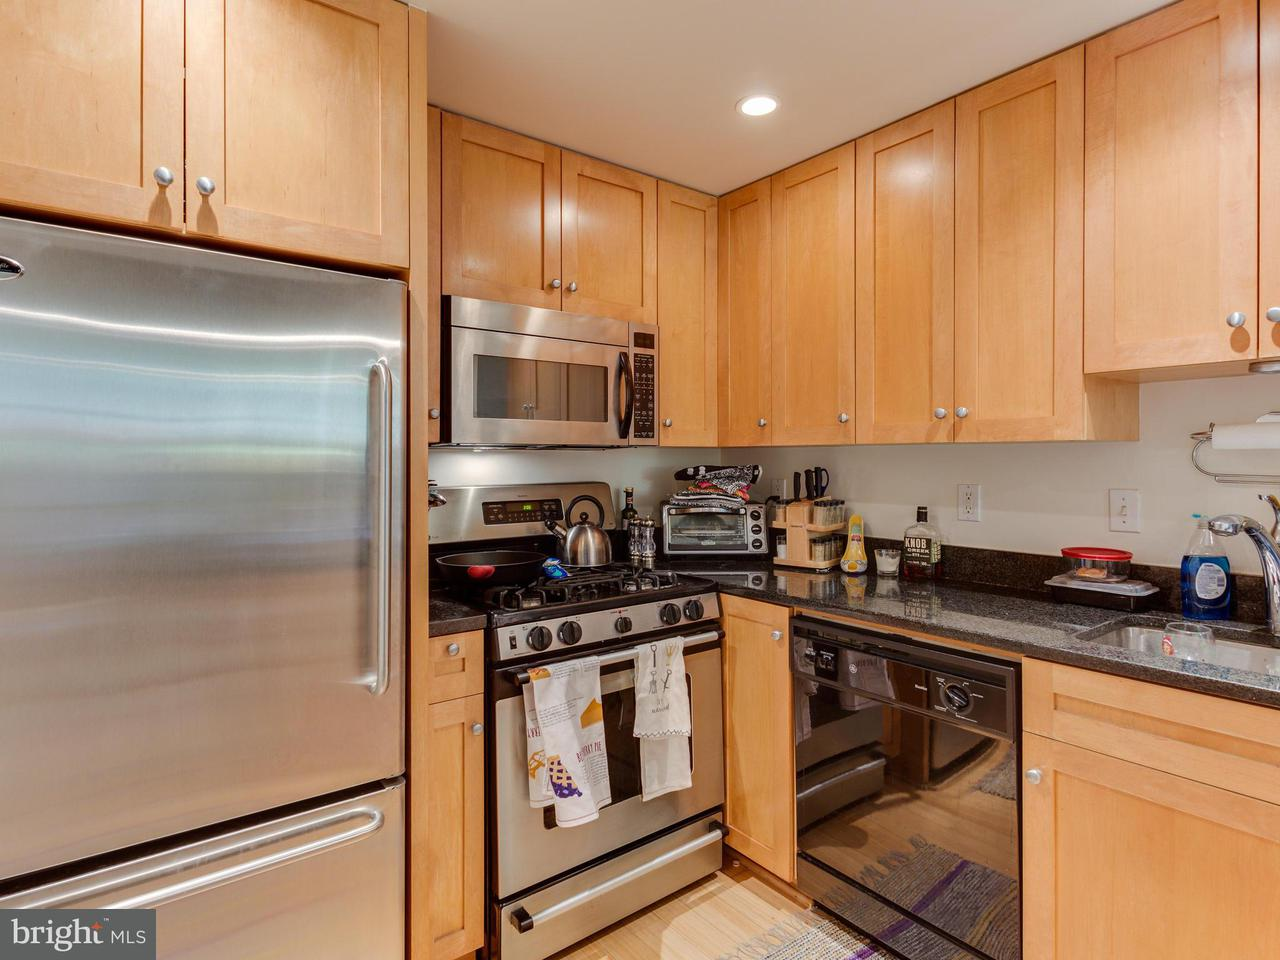 Additional photo for property listing at 2328 Champlain St Nw #202 2328 Champlain St Nw #202 华盛顿市, 哥伦比亚特区 20009 美国